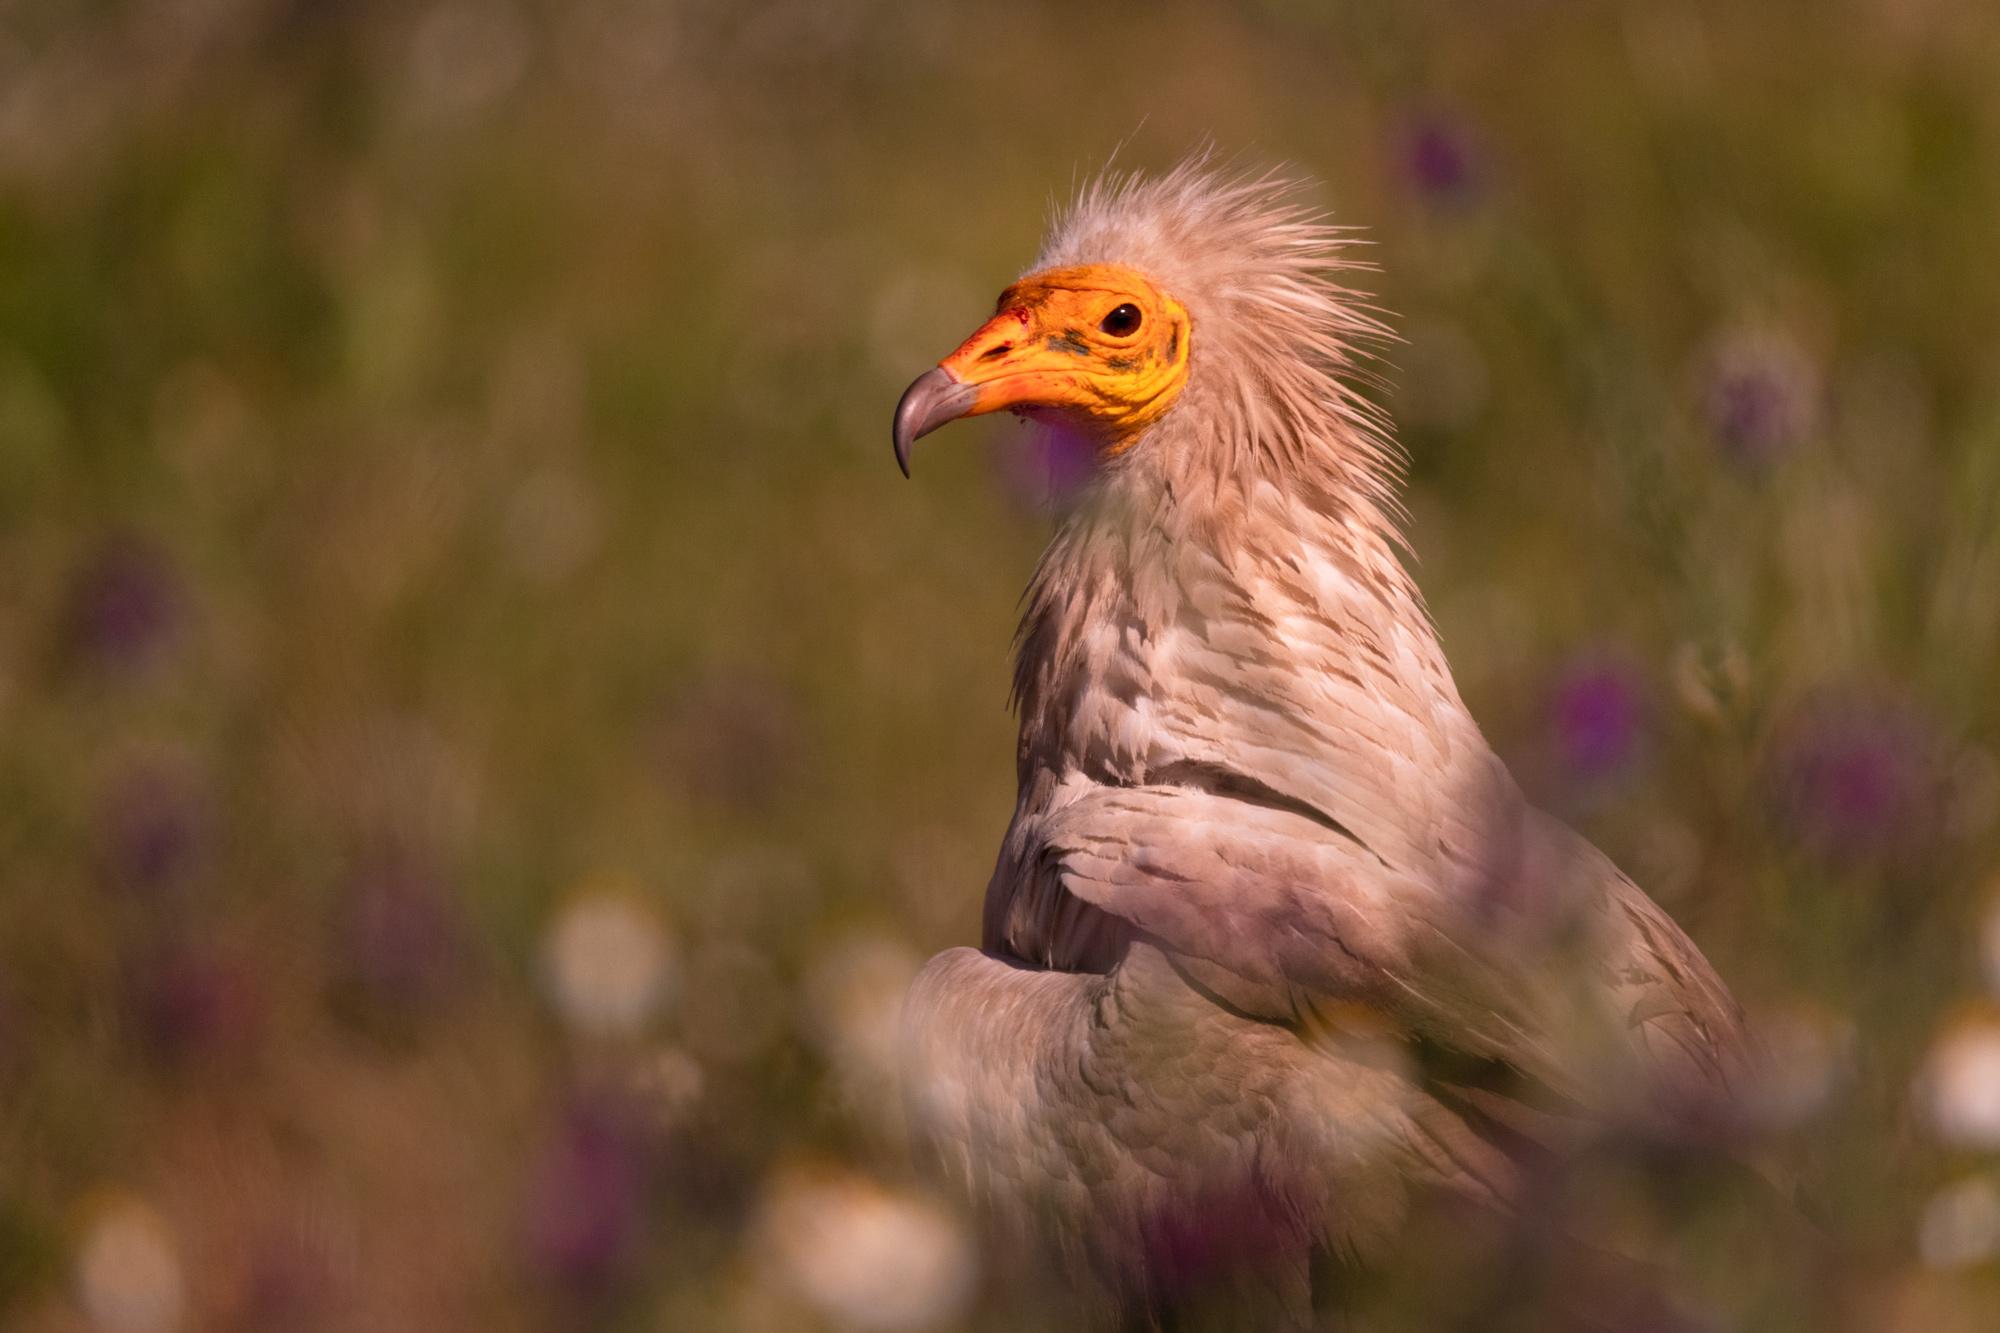 Foto Finalista Vultures Photo Contest ·Casa Daniela· 2019-Entre las flores